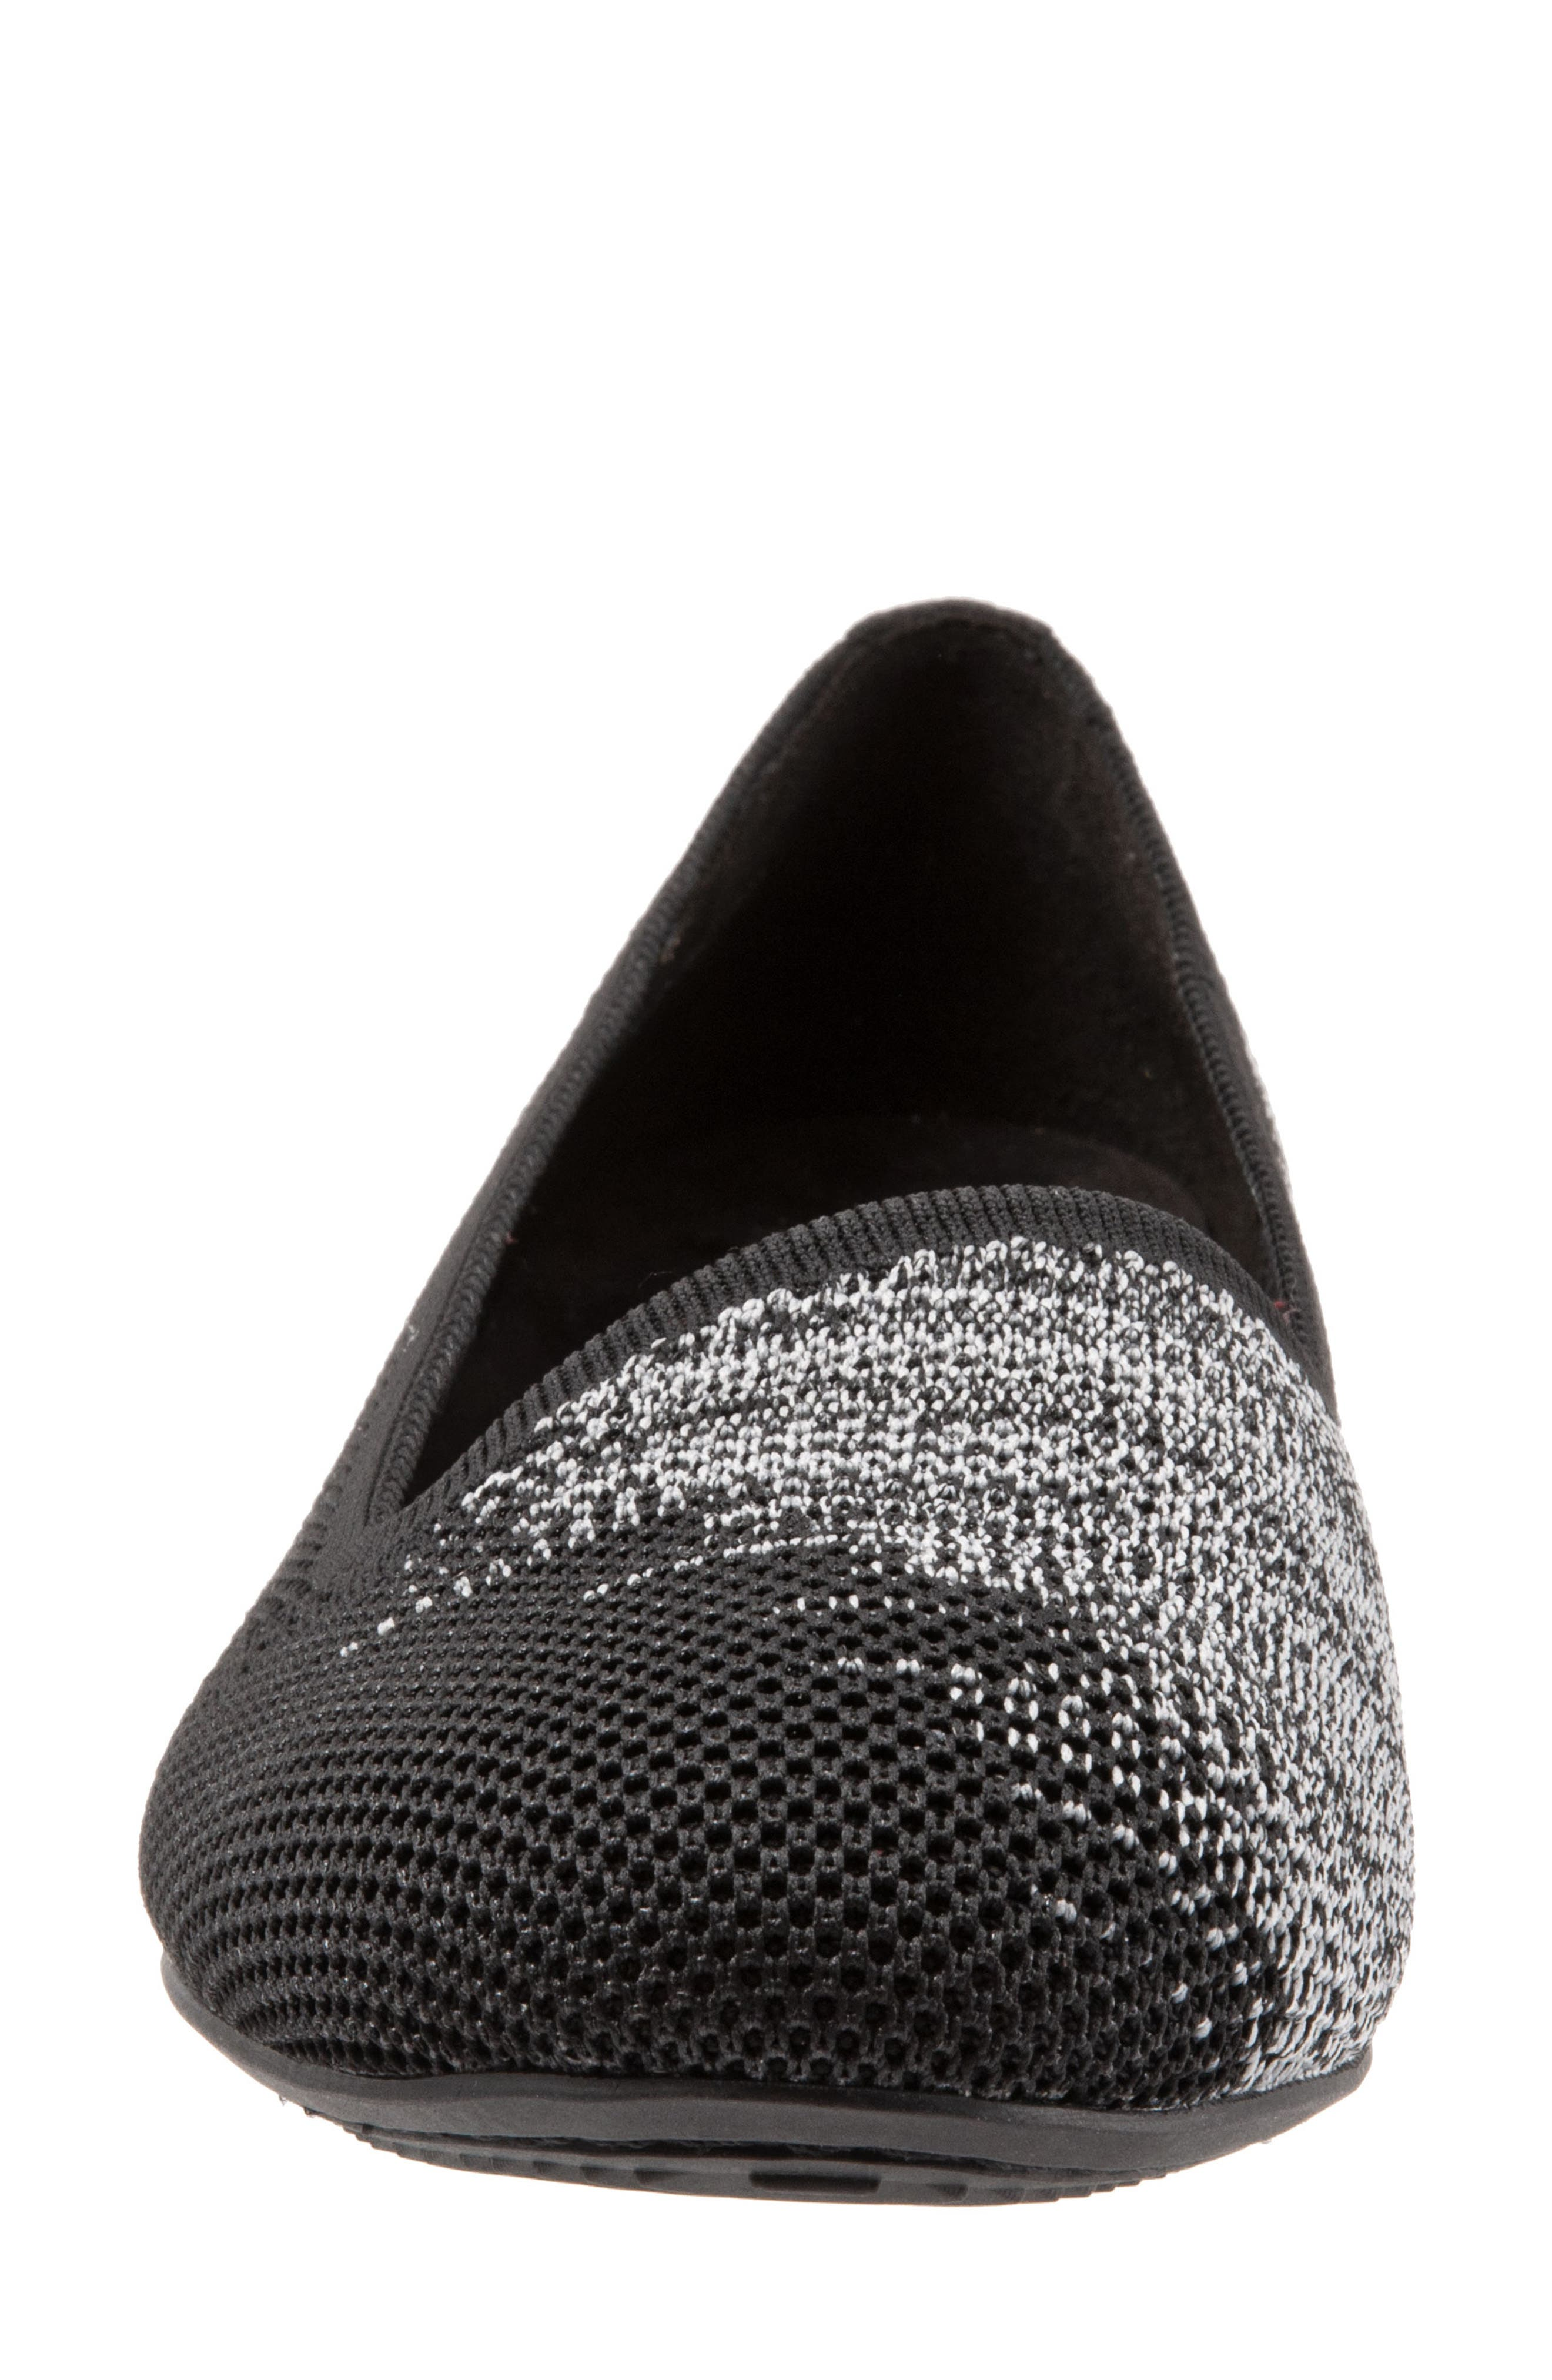 Sicily Knit Flat,                             Alternate thumbnail 4, color,                             BLACK KNIT FABRIC